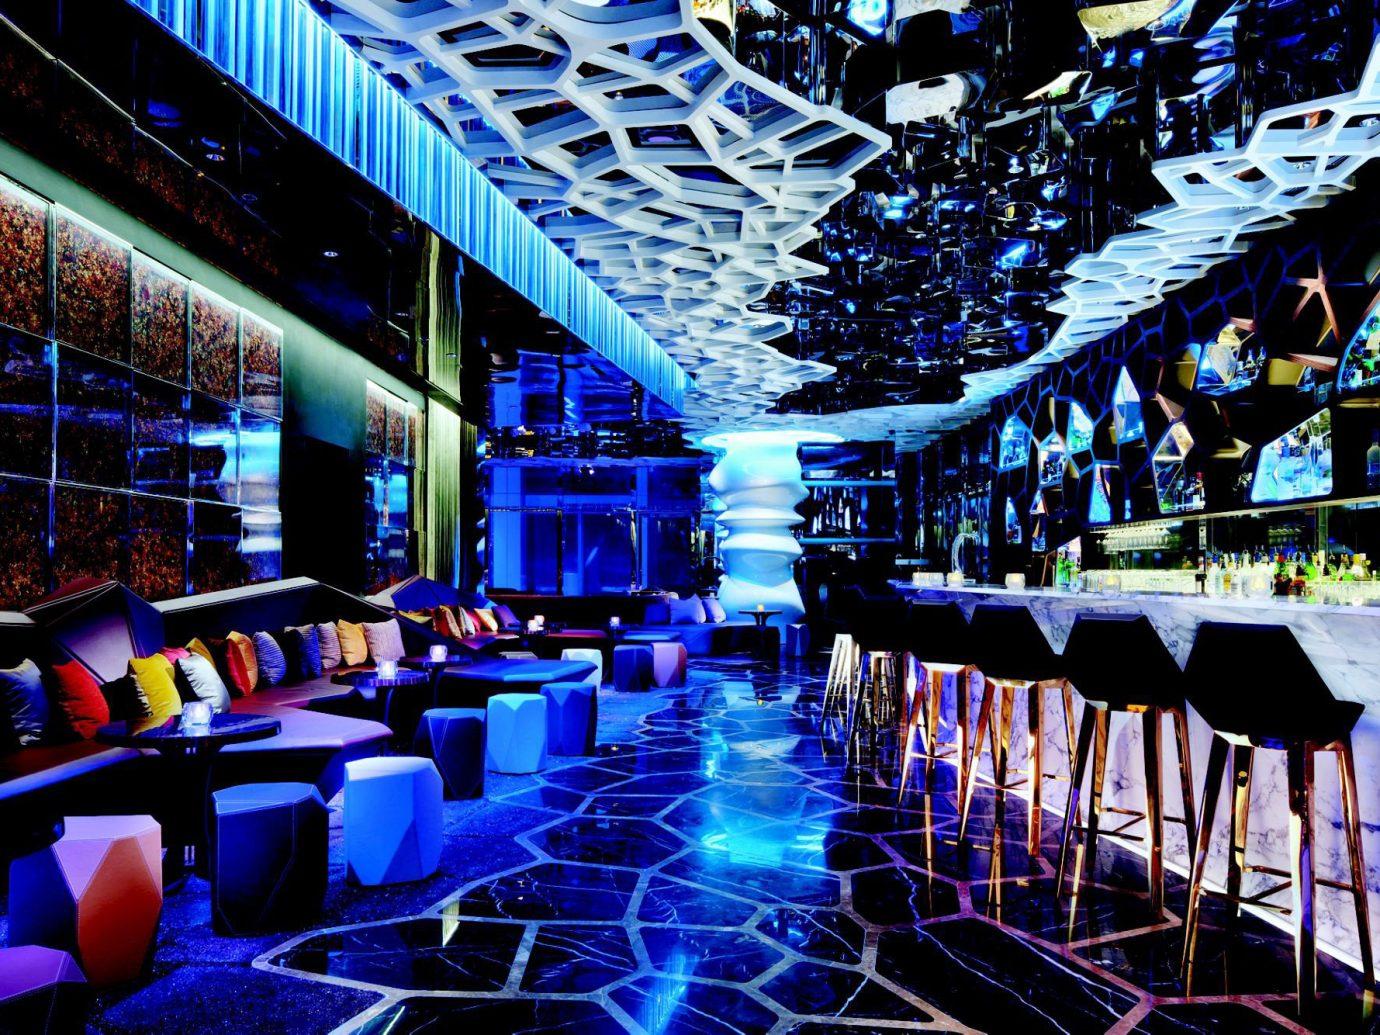 Hotels function hall meal nightclub convention center auditorium ballroom line